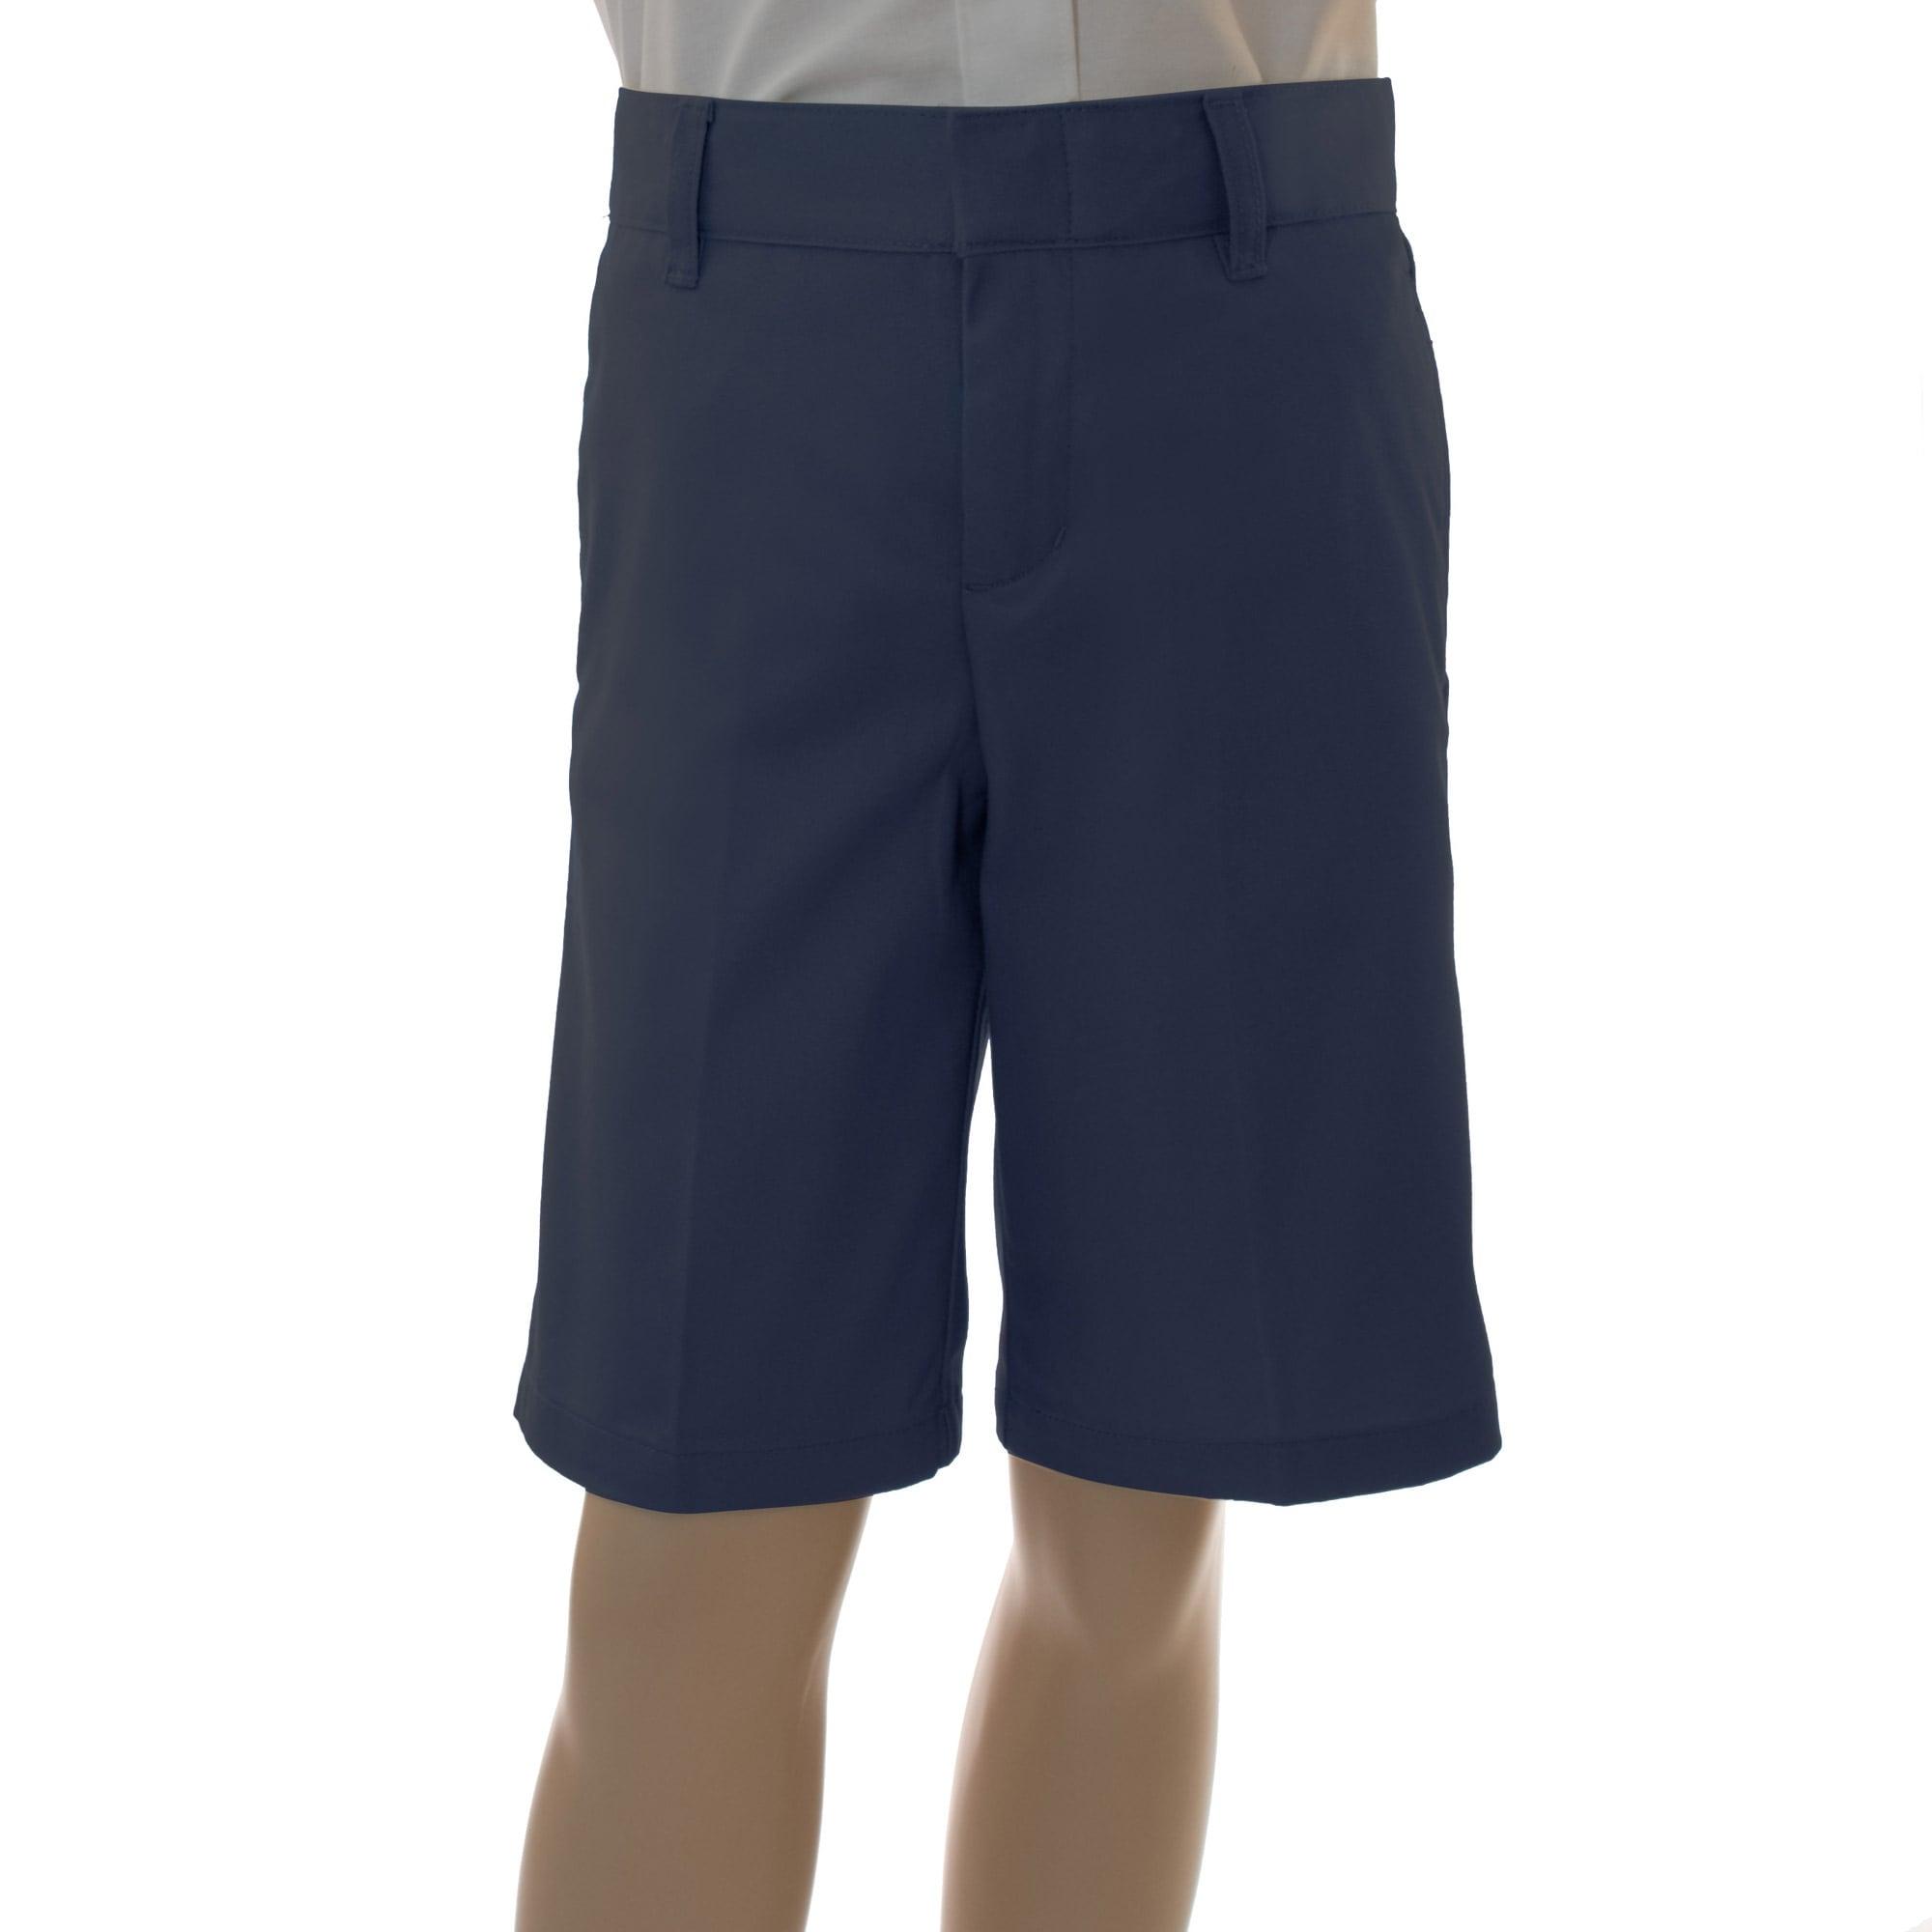 French Toast Boy's School Uniform Shorts (Set of 2) FINAL SALE